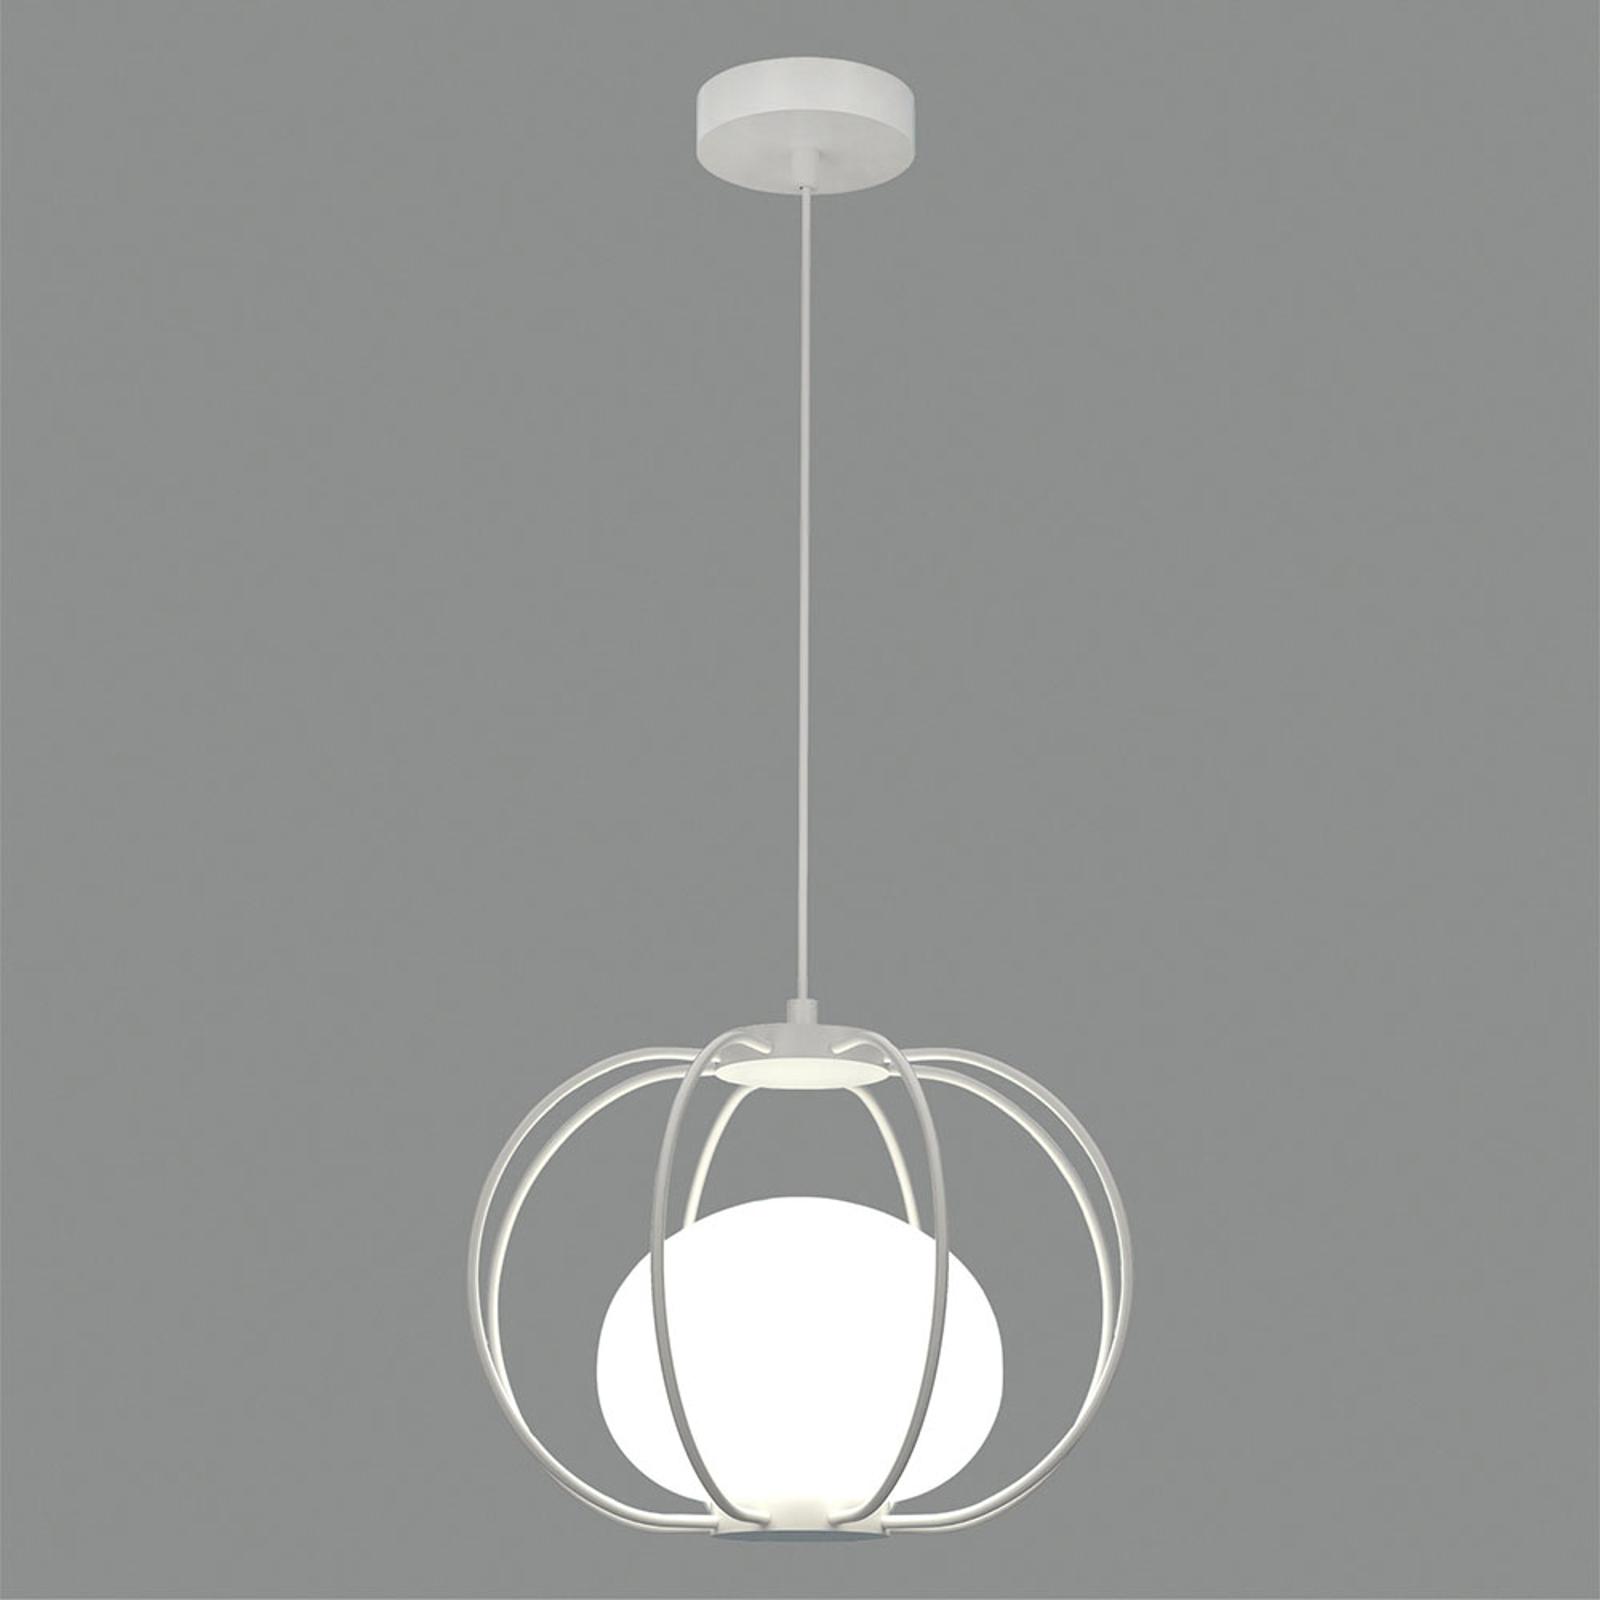 Lampa wisząca Marina G9 Ø 30 cm